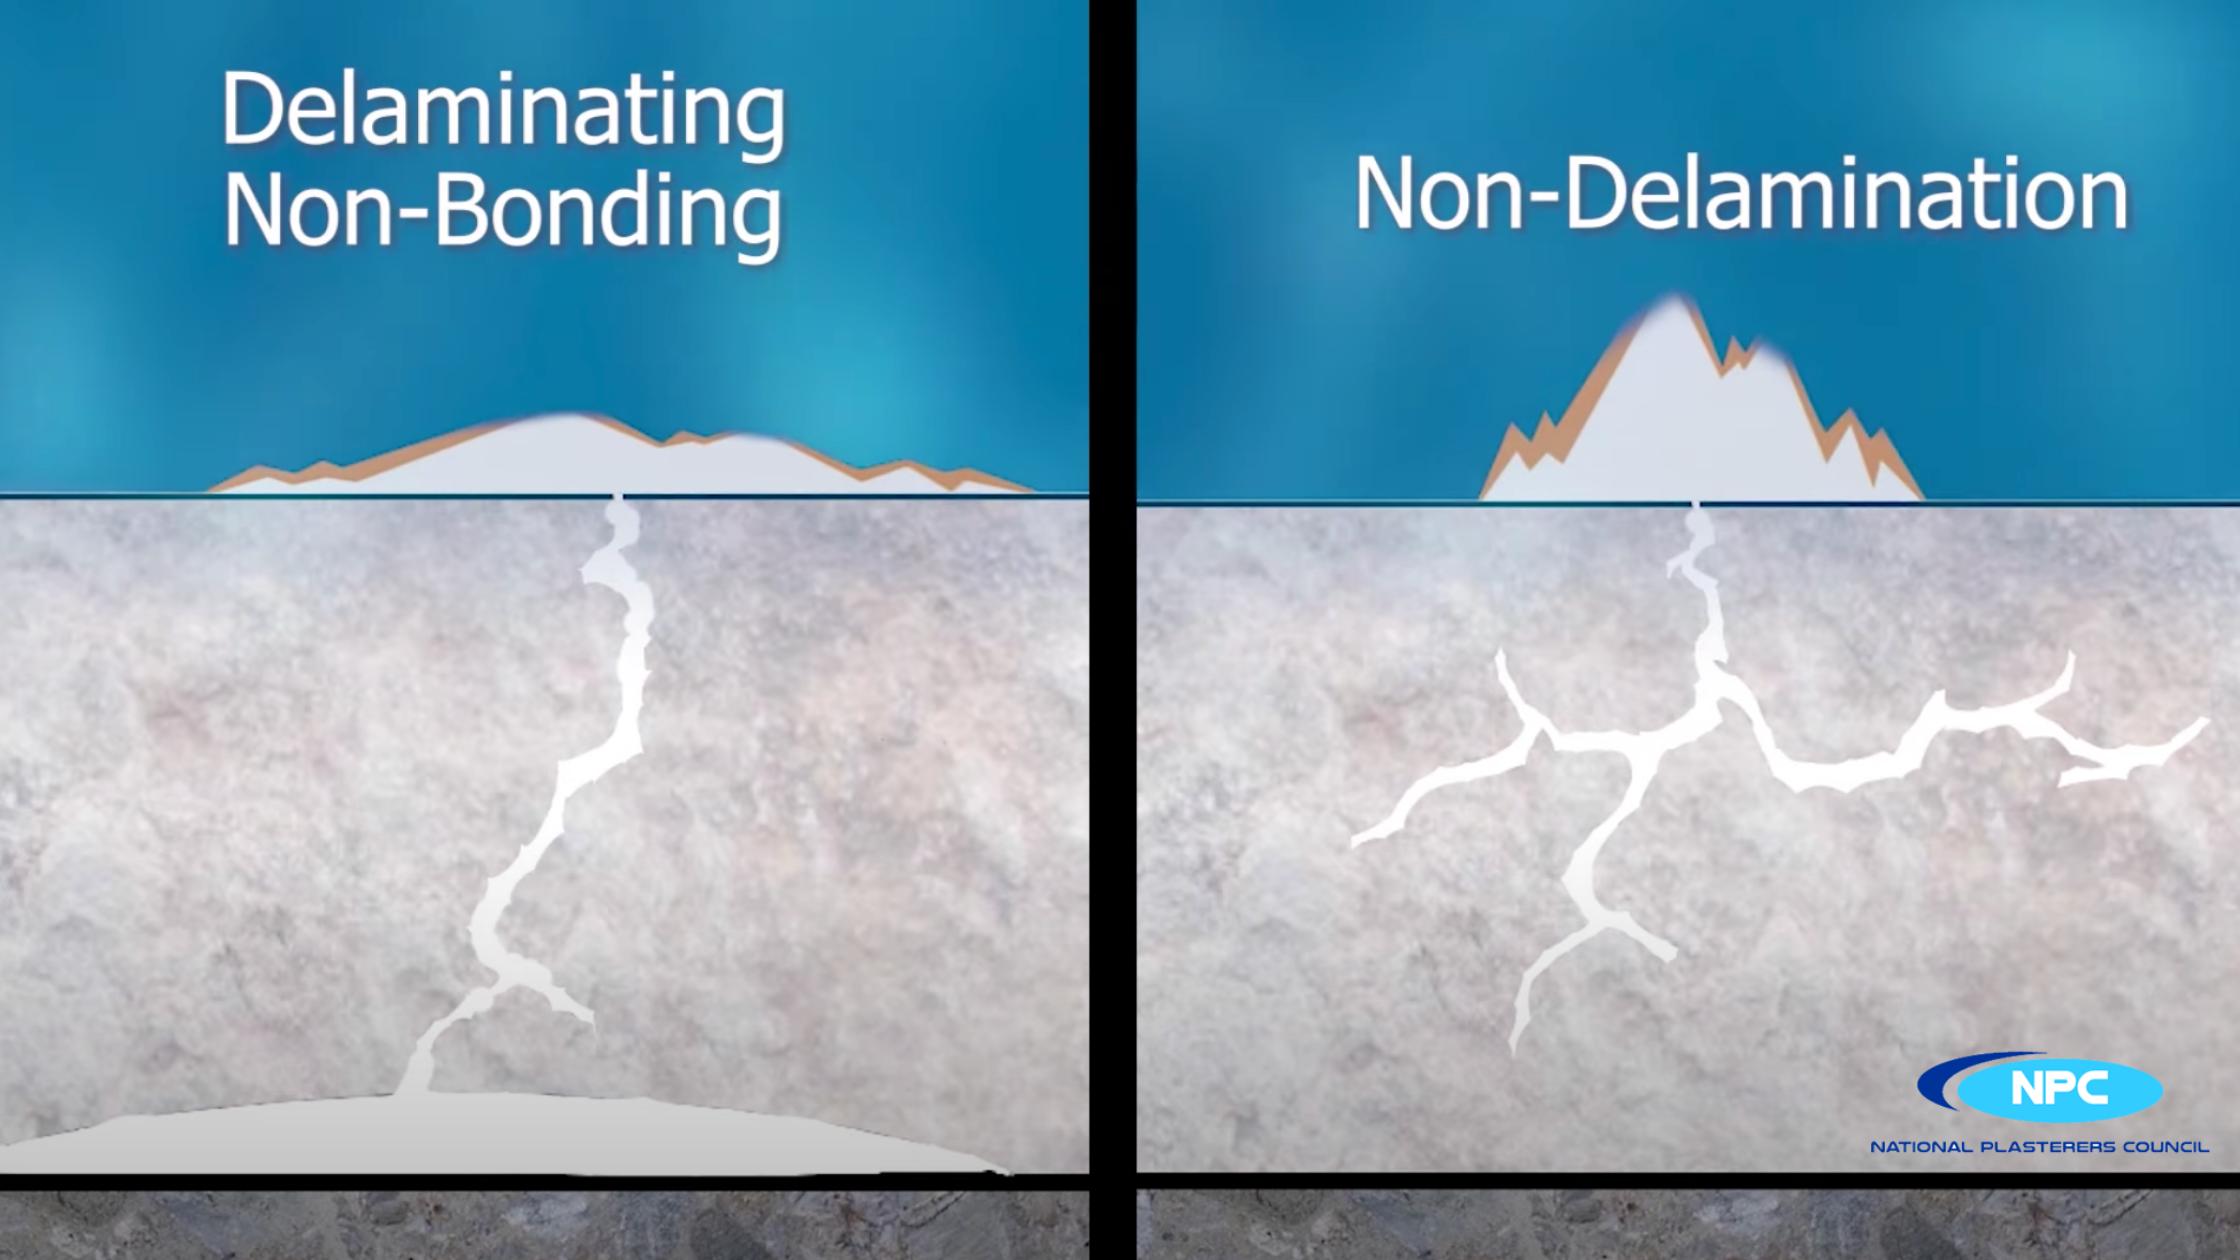 delaminating non-bonding vs non-delamination